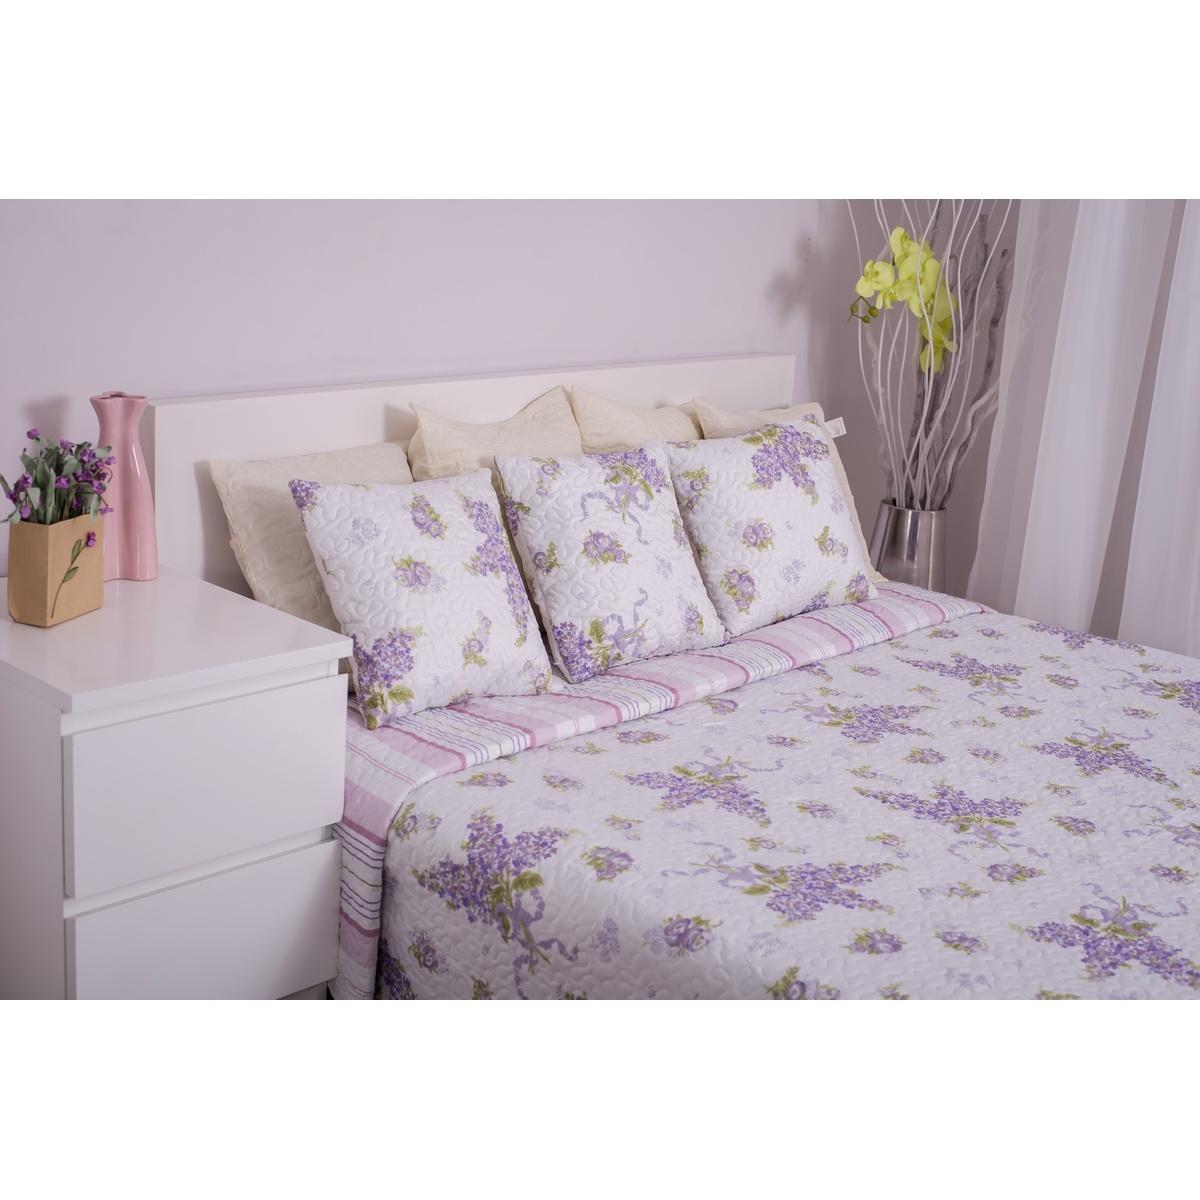 Domarex Přehoz na postel Levandulová zahrada, 220 x 240 cm